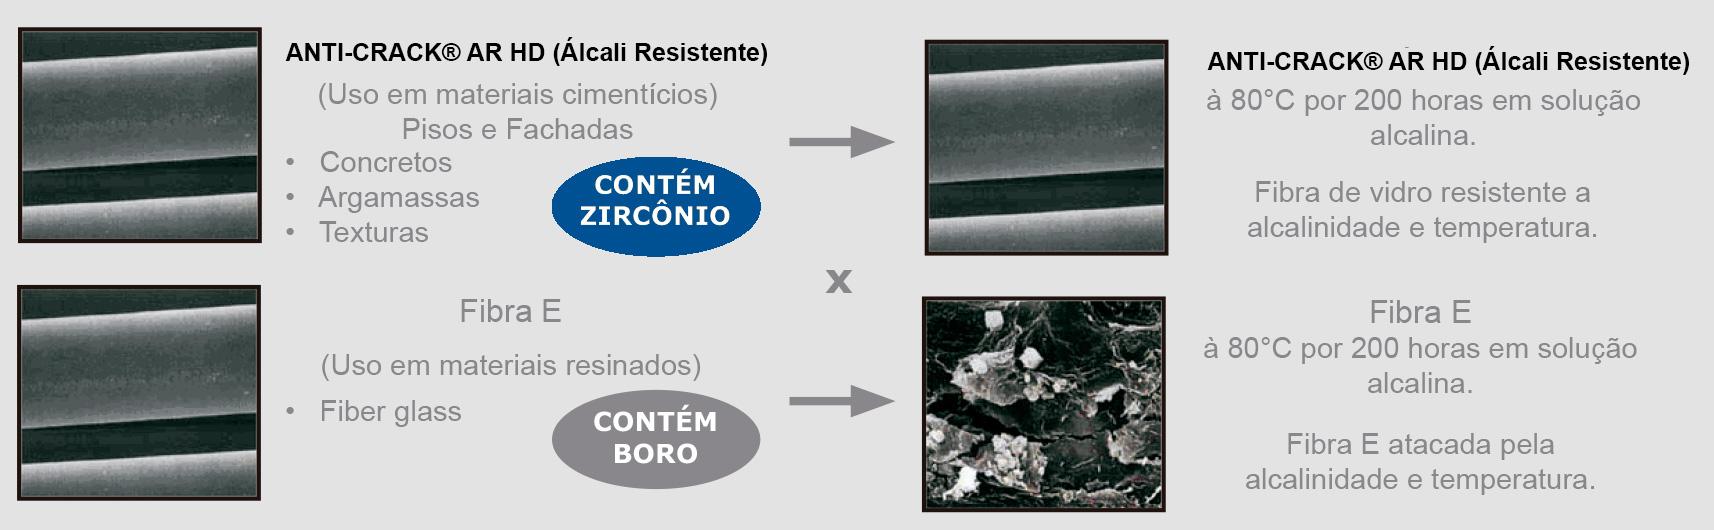 Durabilidade da Fibra de Vidro para Concreto AR